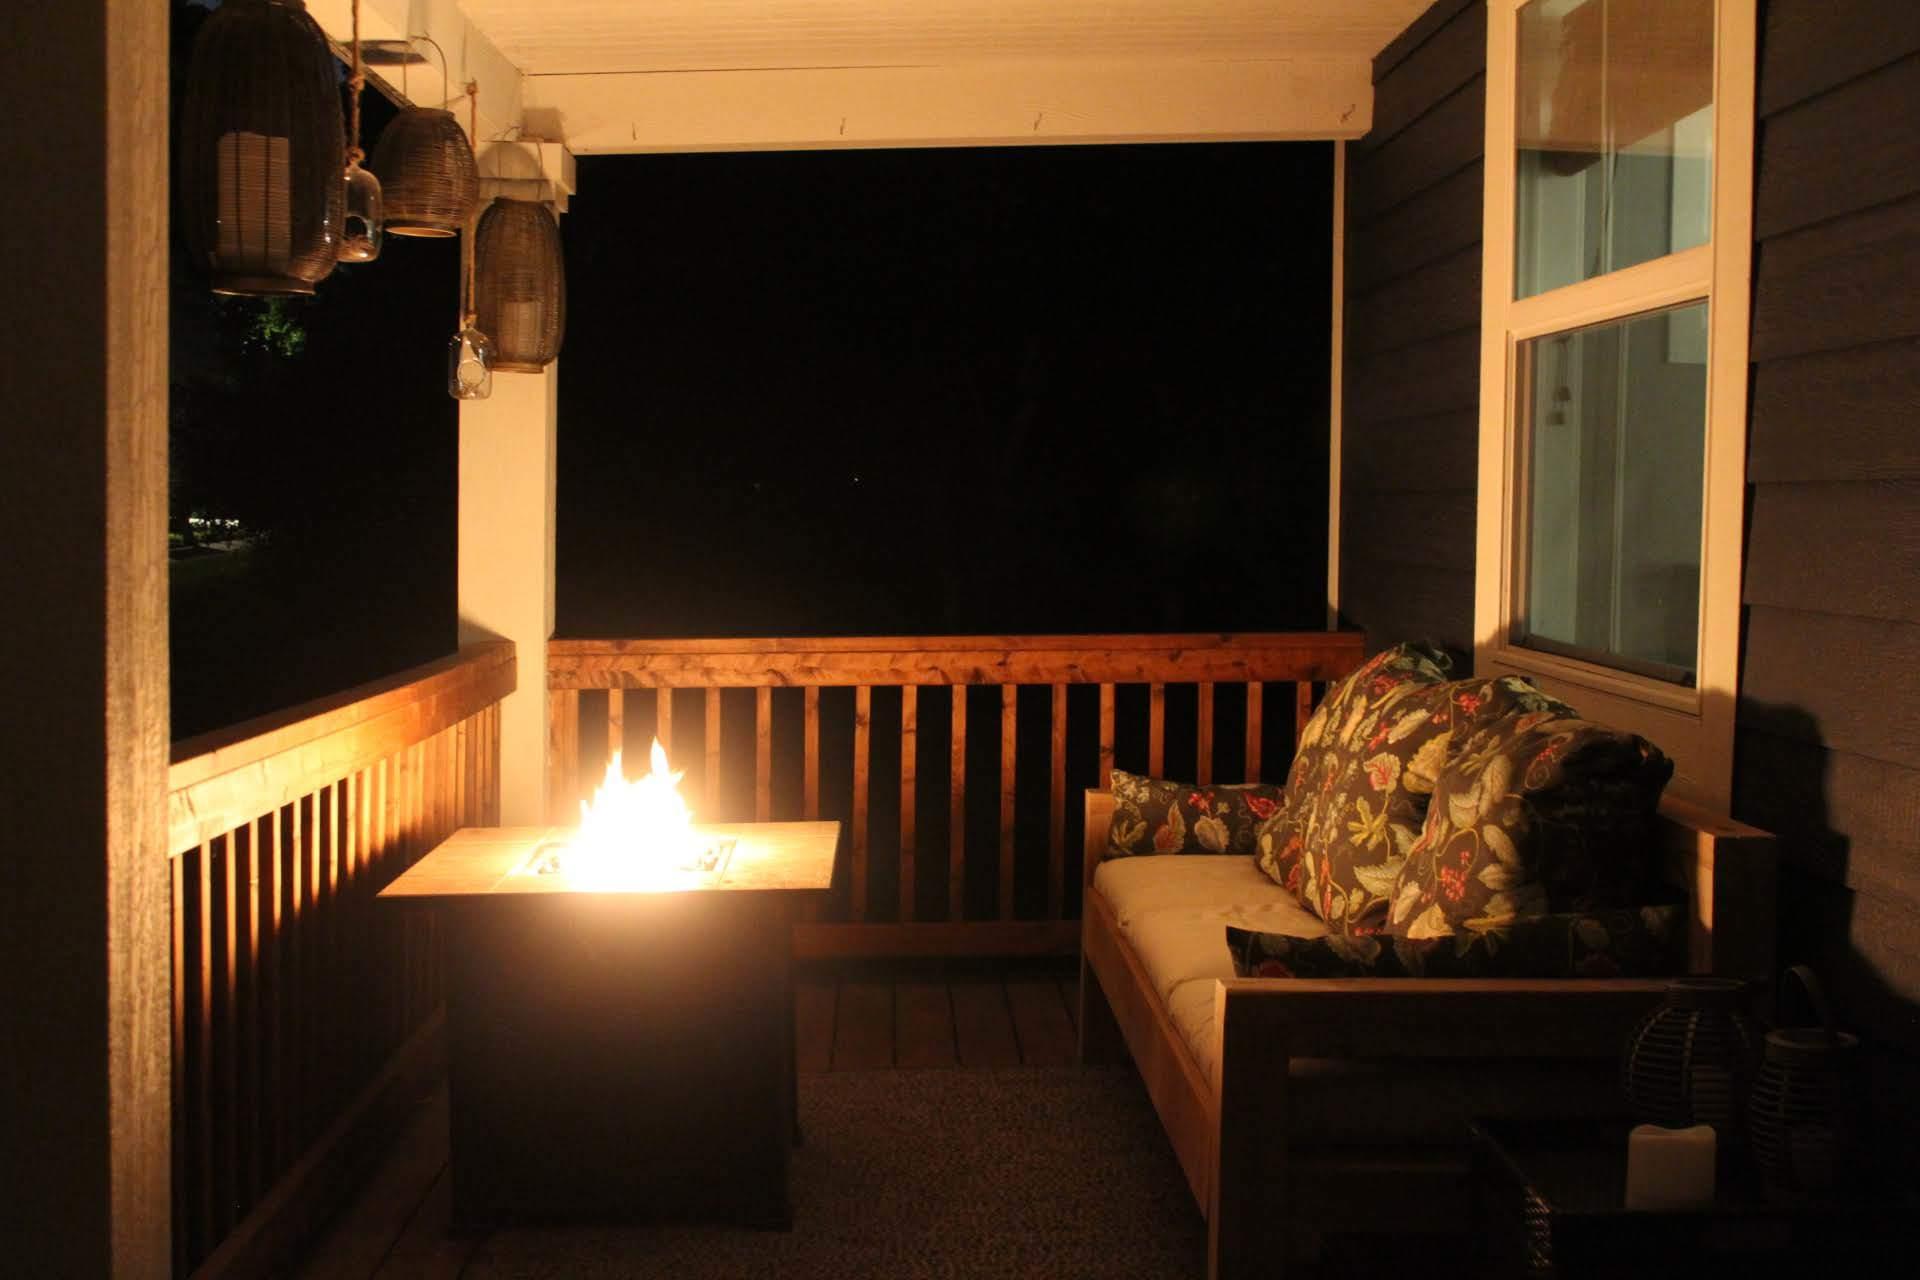 Night time photo